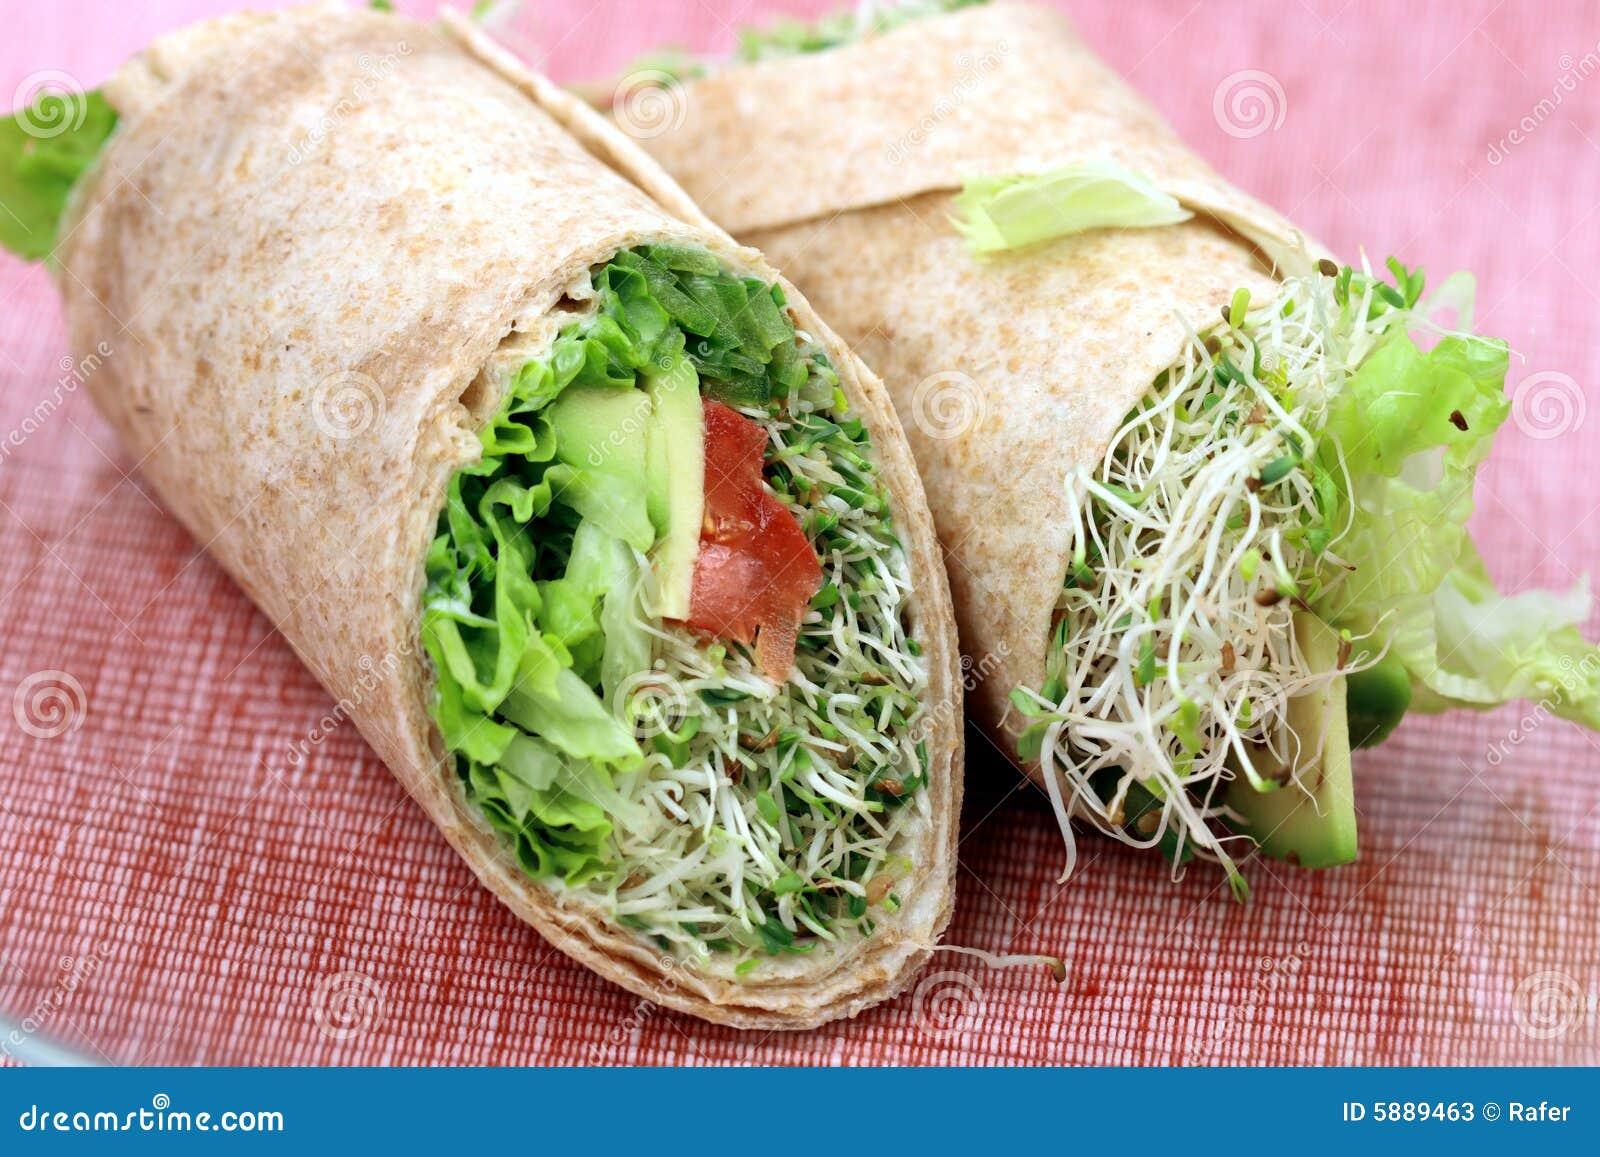 Vegan Sandwich Wraps Stock Image Image Of Organic